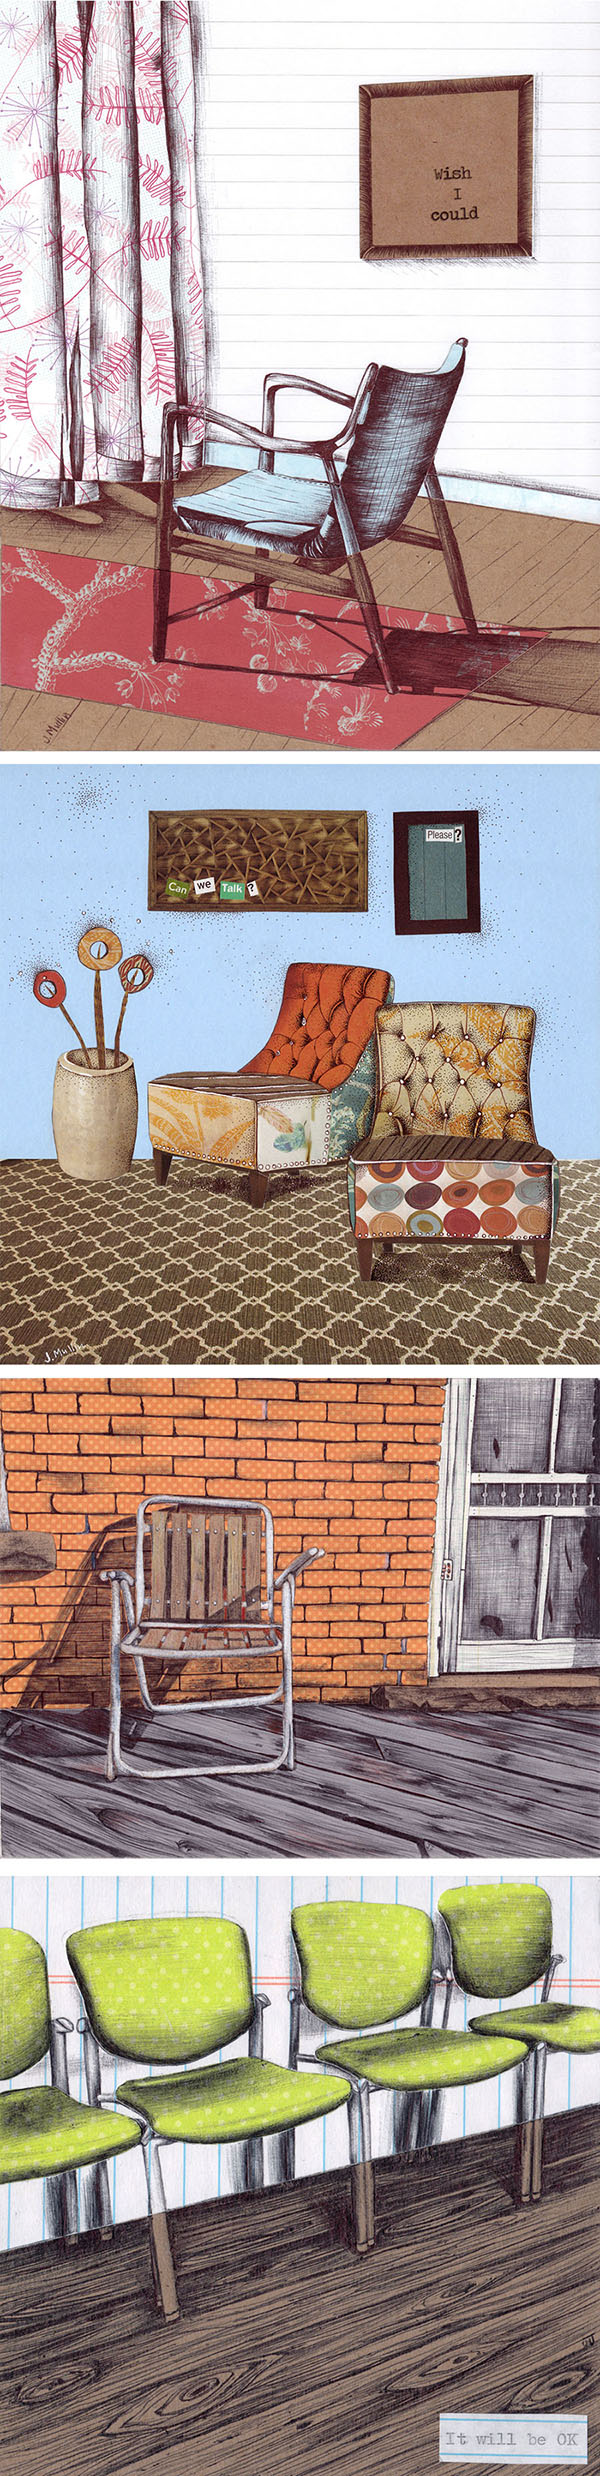 Sad Chair Illustrations by Jennifer Johansson